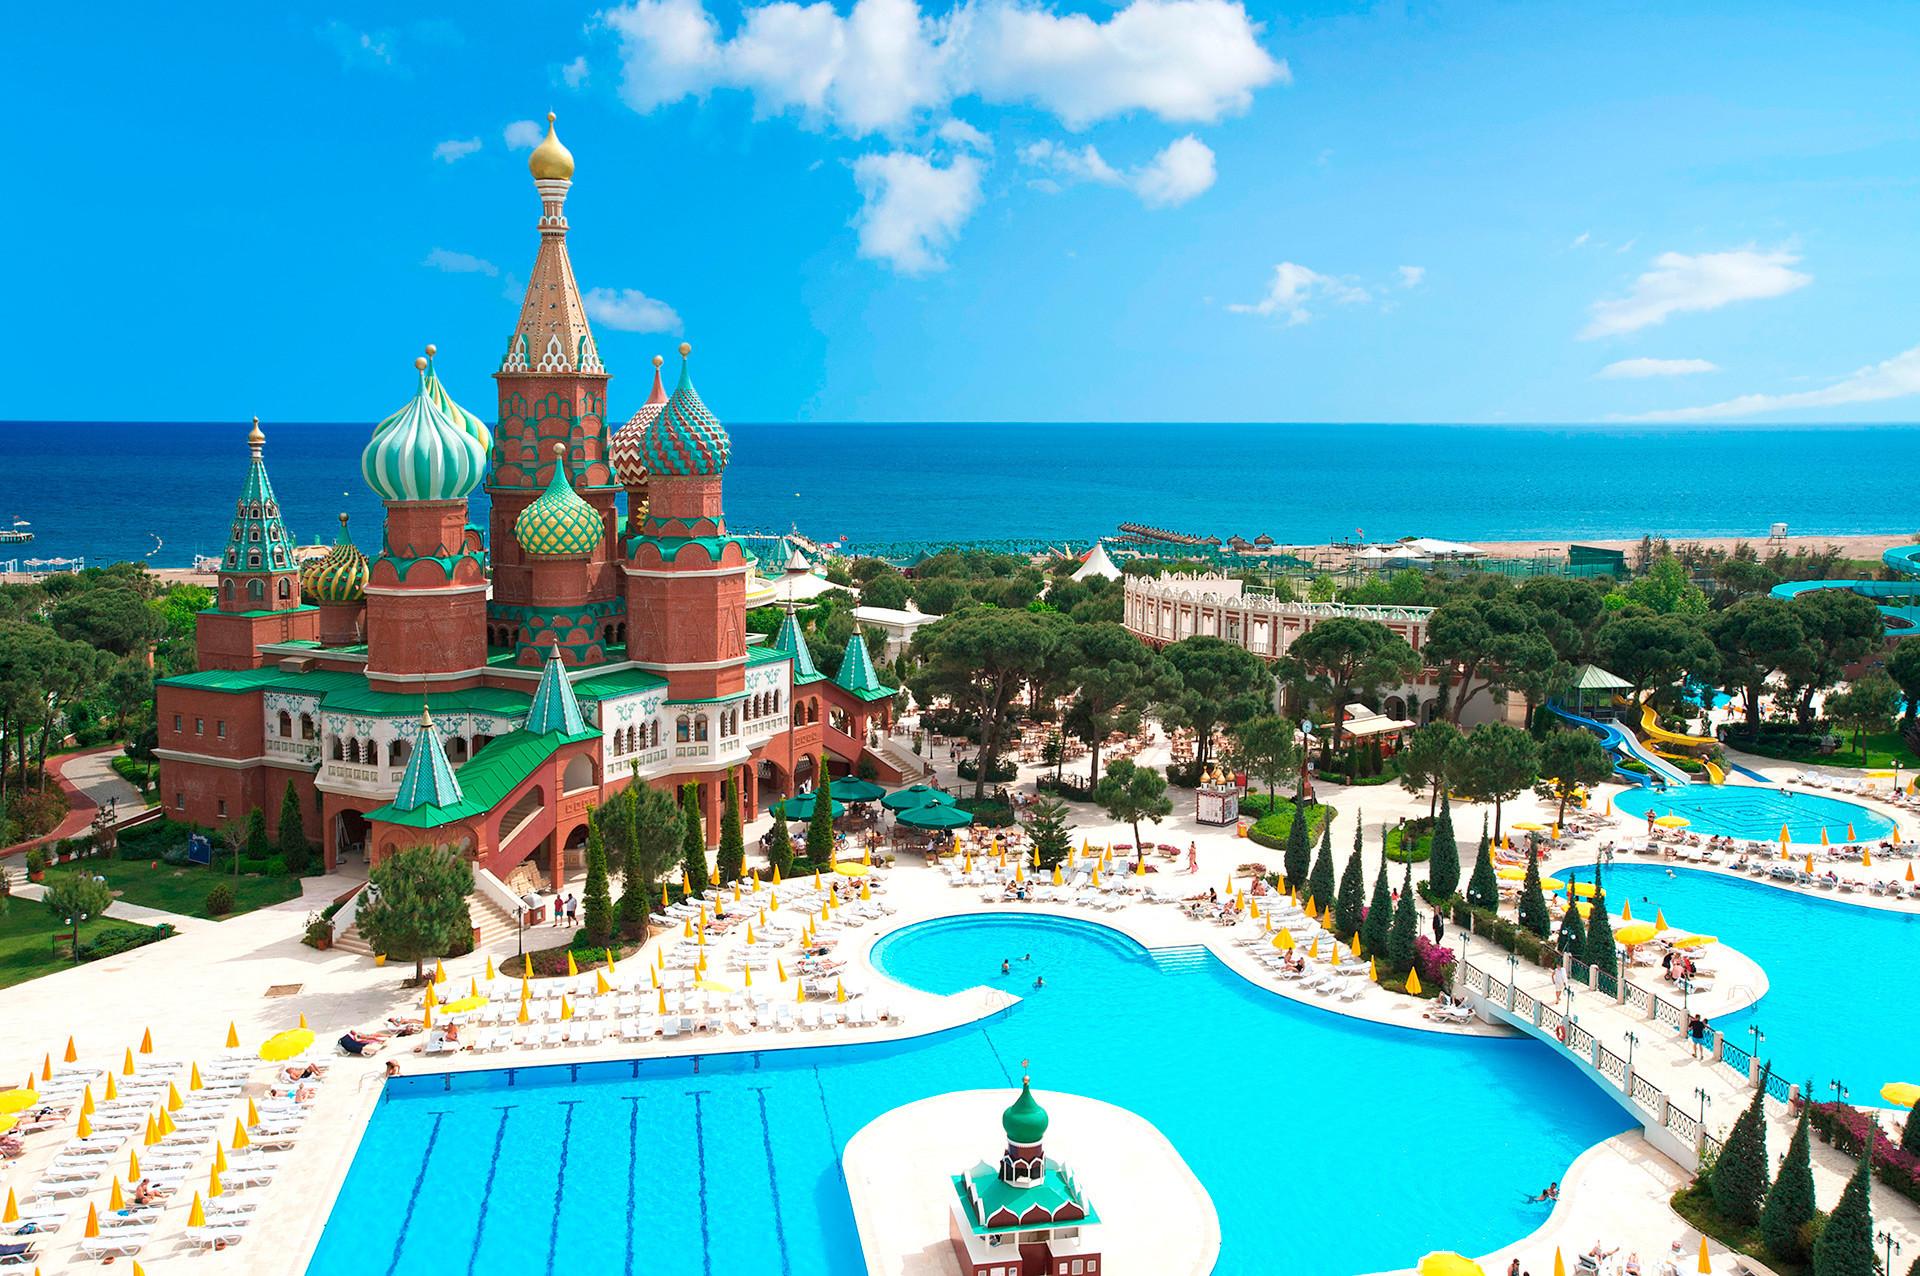 Hotel Kremlin Palace u Antalyi u Turskoj.